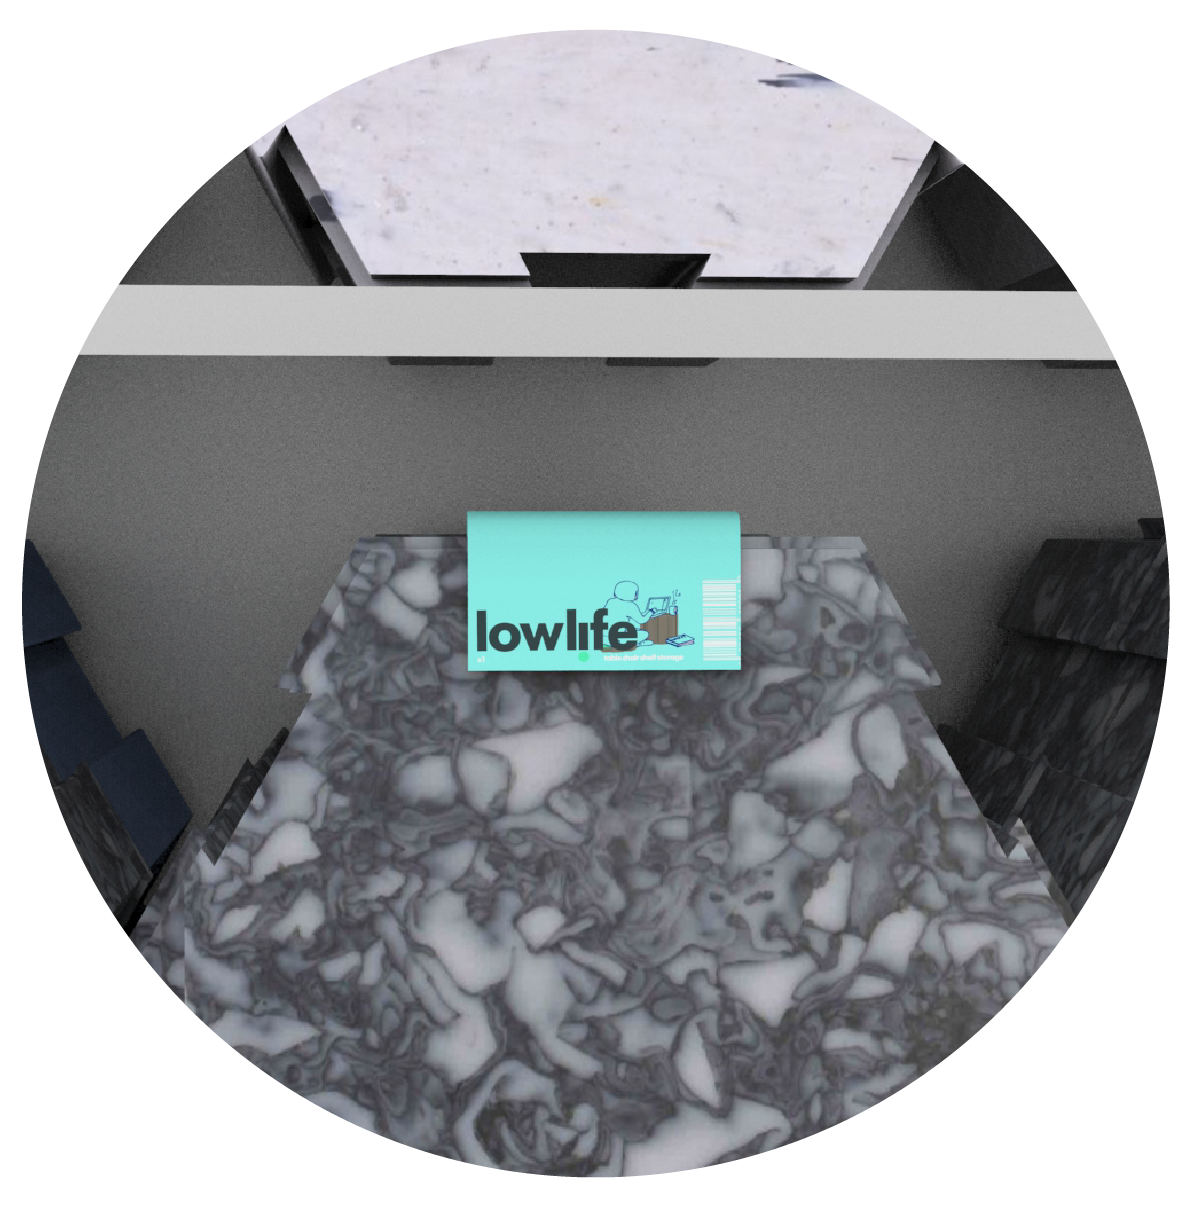 lowlifeCircle-01.png